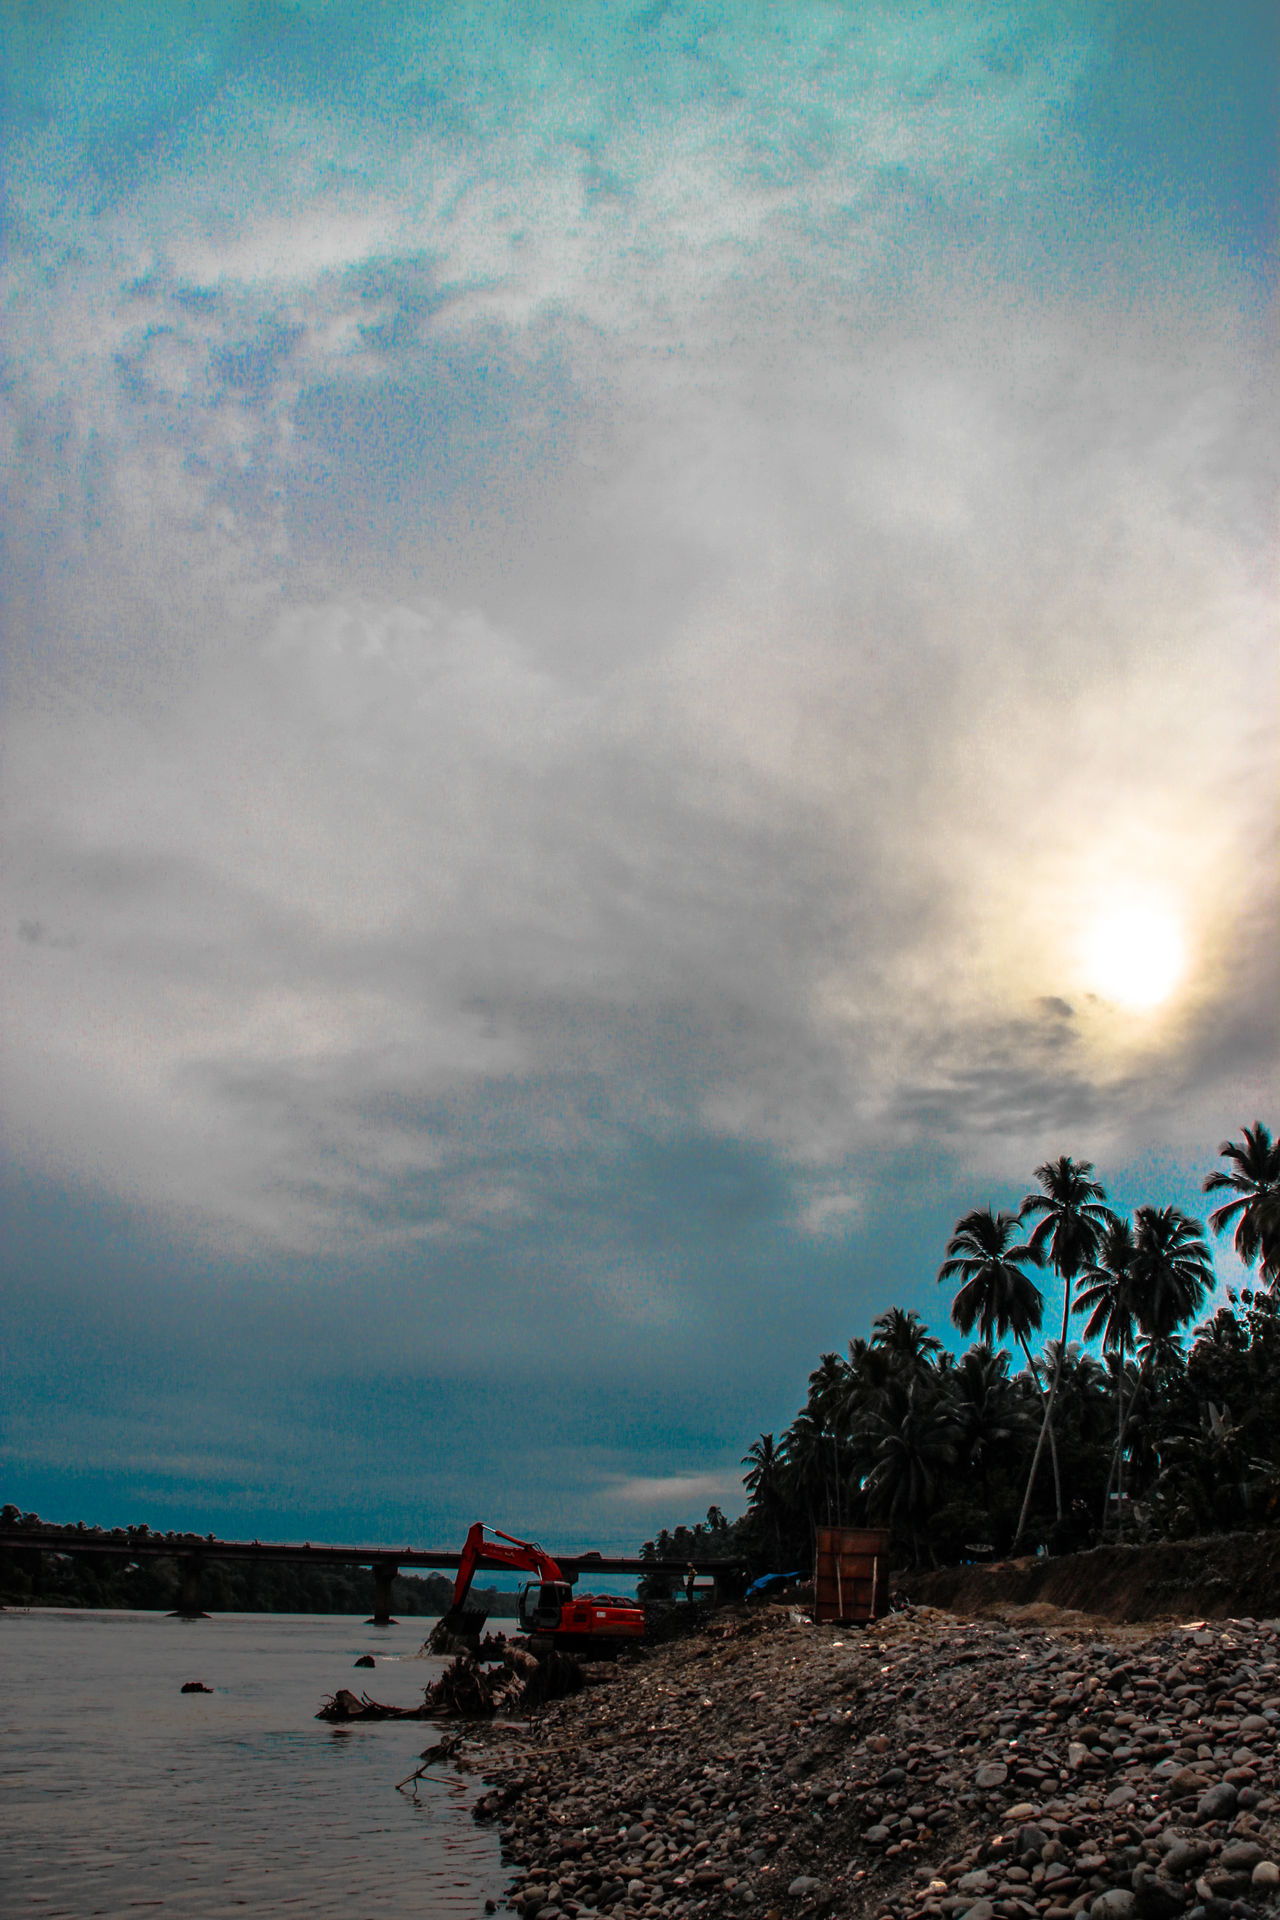 Batang Hari River Landscapes With WhiteWall Dharmasraya,Sungai Dareh Bridge Sumateta Barat Clouds And Sky Variation EyeEm Best Shots - Nature EyeEm Gallery Riverside Photography River View